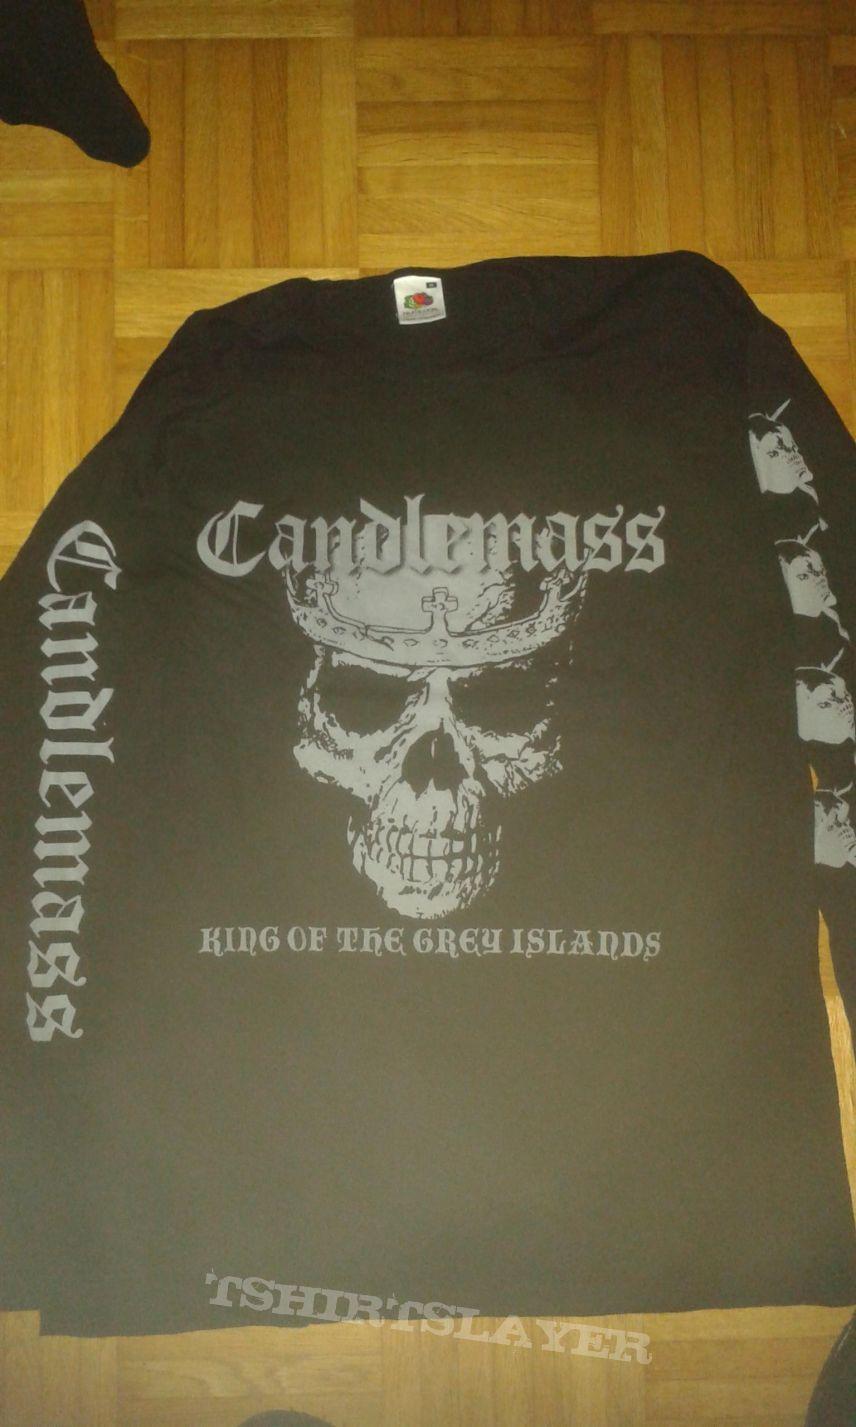 Candlemass King of the grey island tour  longsleeve (Medium)